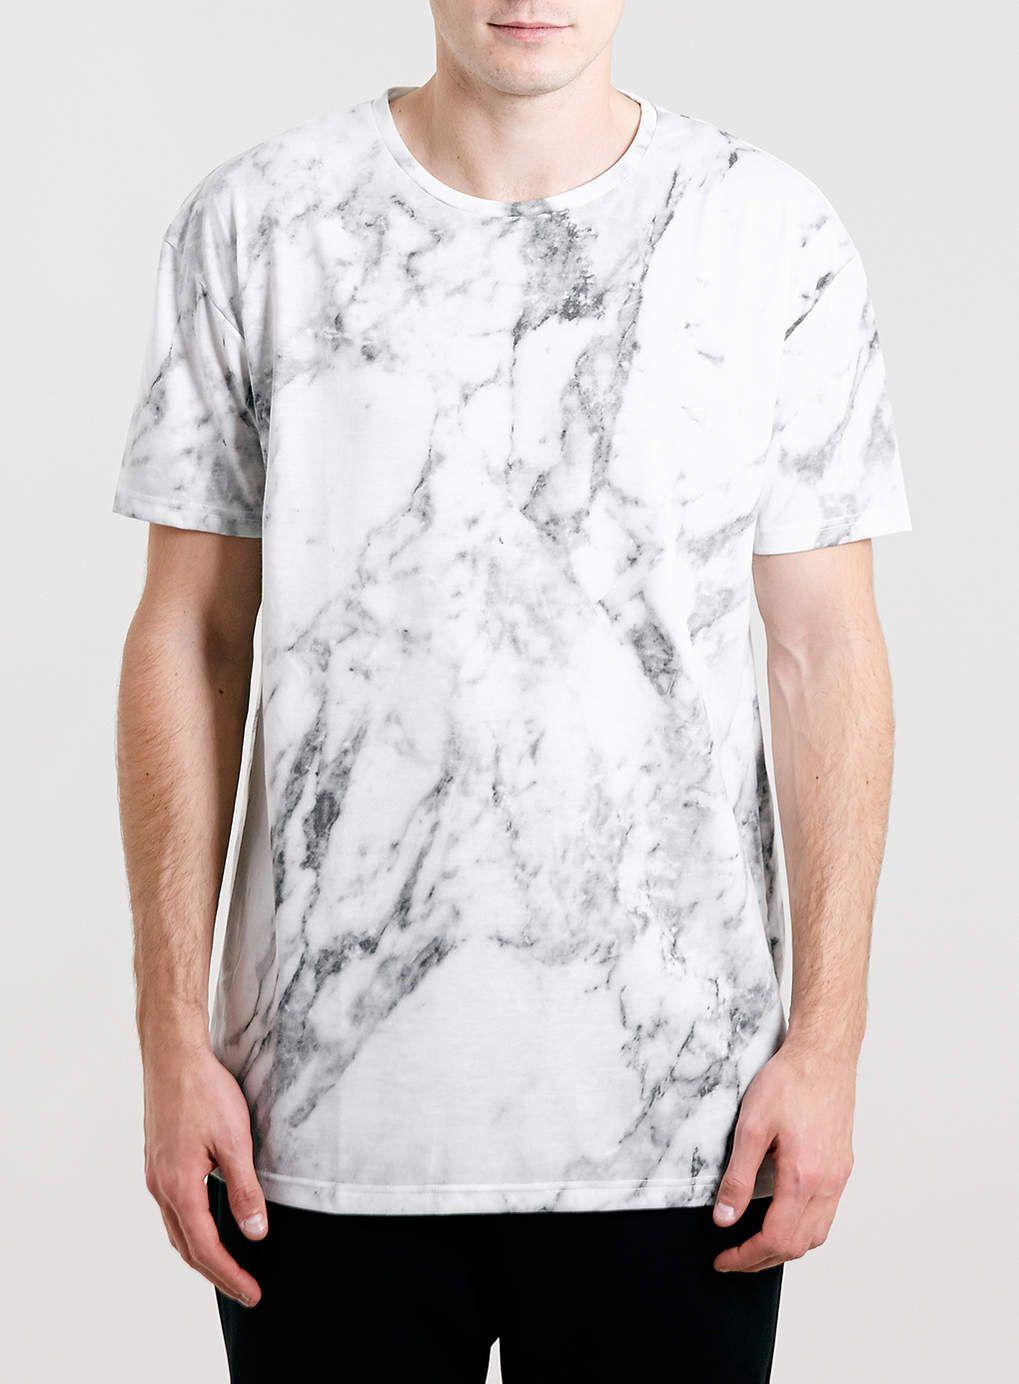 61abbdd84 TOPMAN GREY MARBLE PRINT T-SHIRT | Piggies | Mens tee shirts, Mens ...